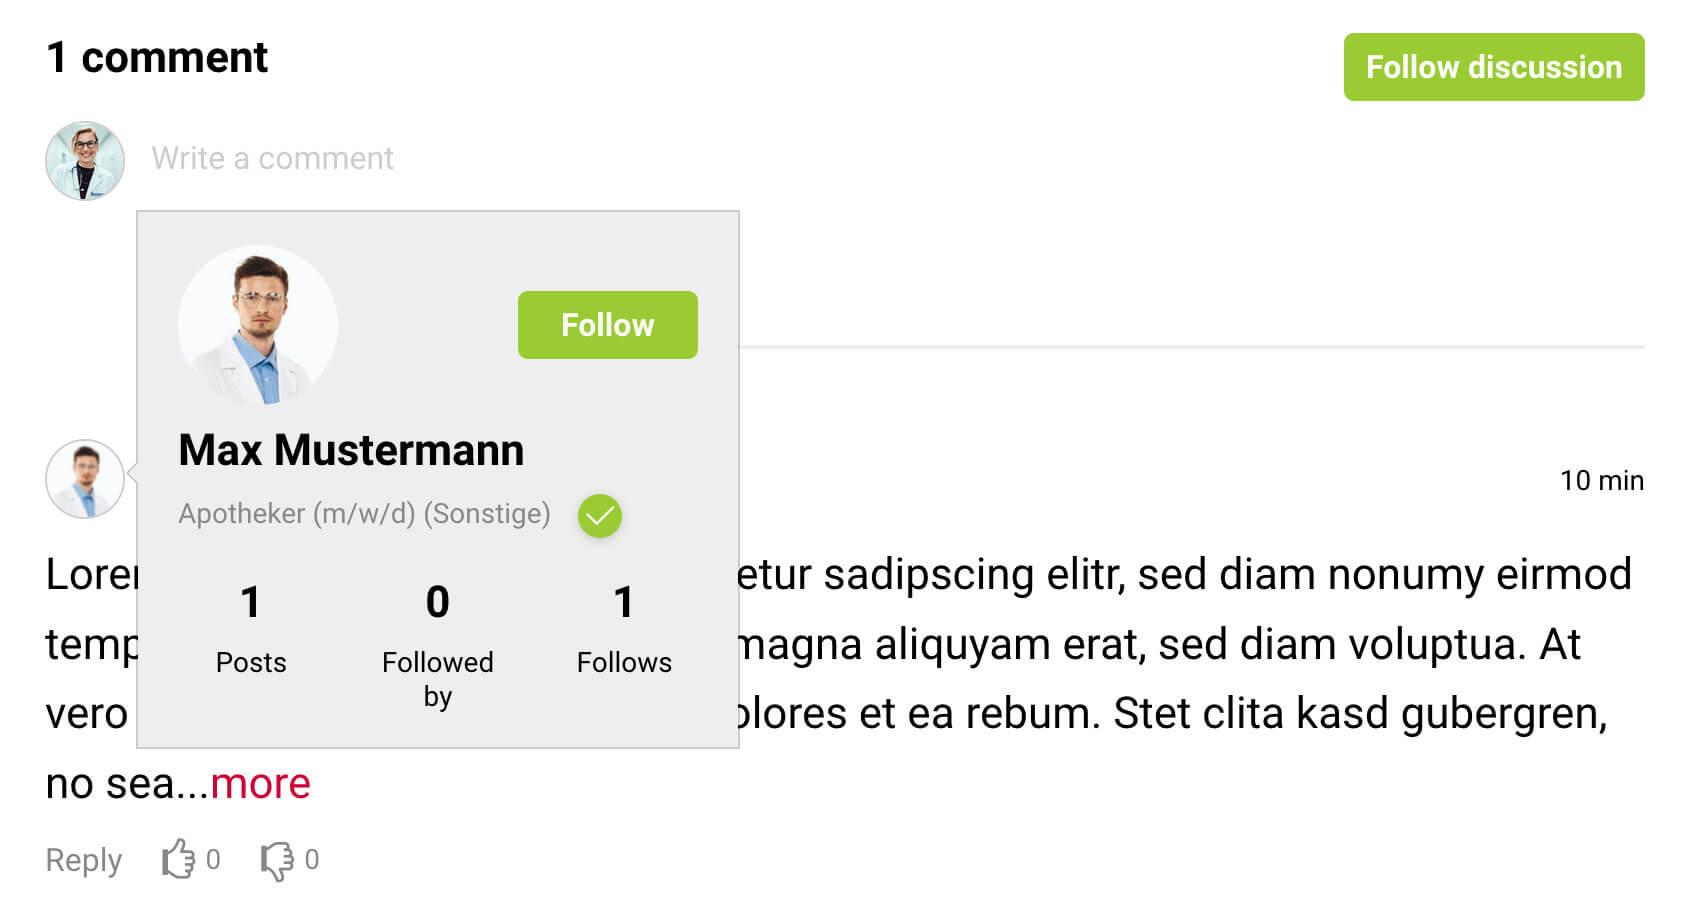 kommentarbereich_folgen-button_max_en_original.jpg